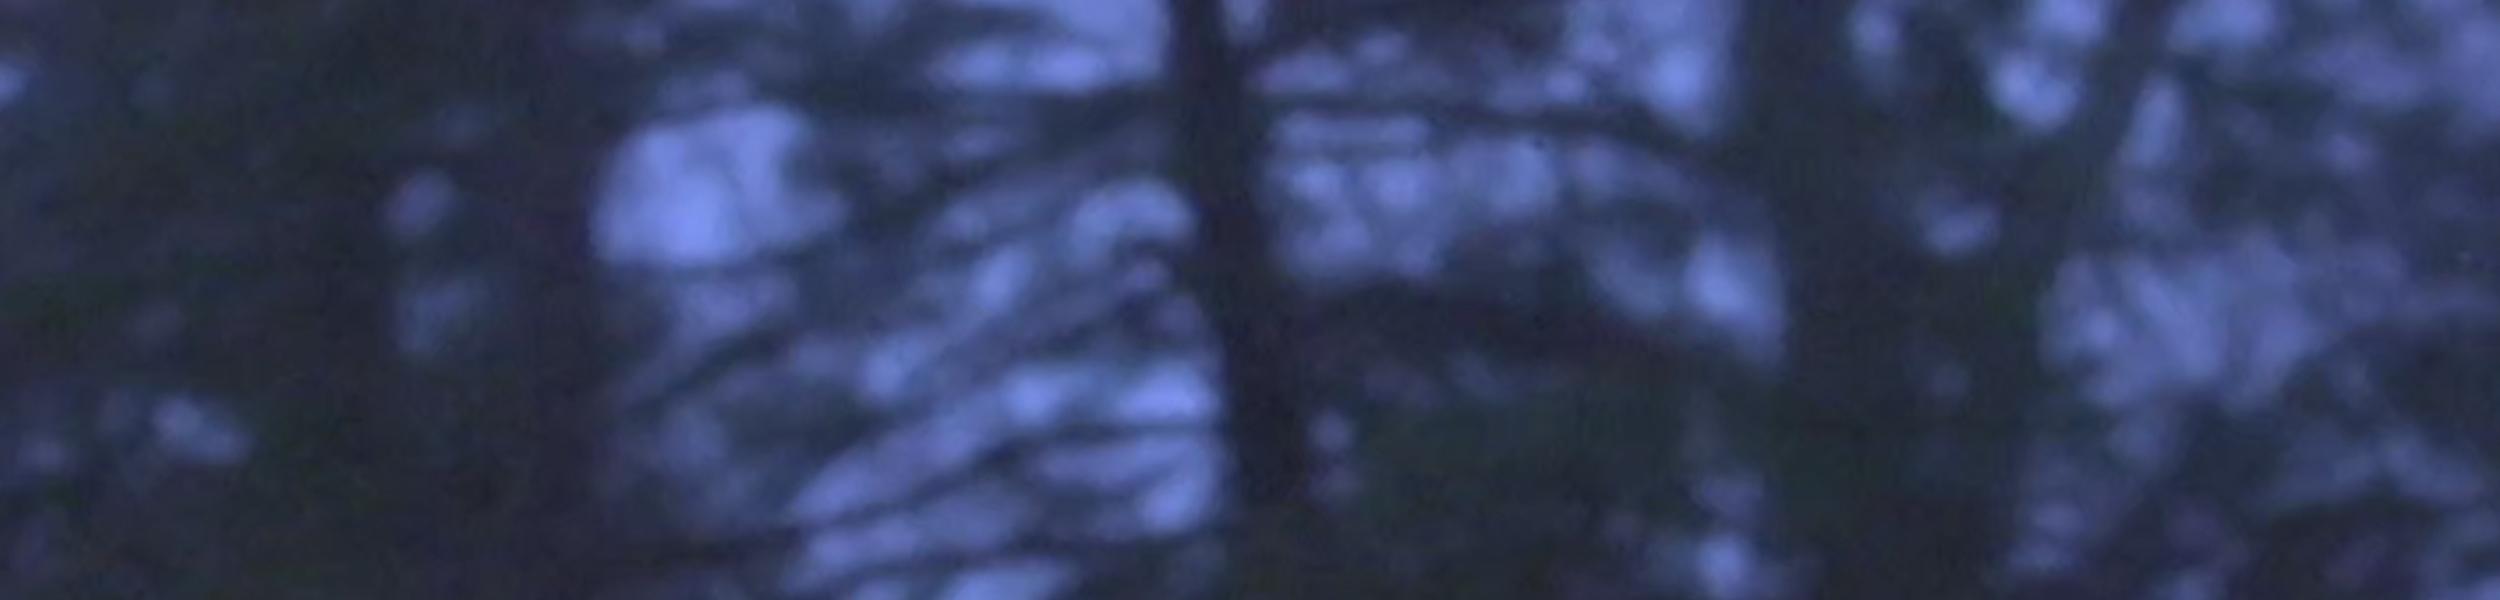 Adrianne Lenker - 'dragon eyes' Out Now